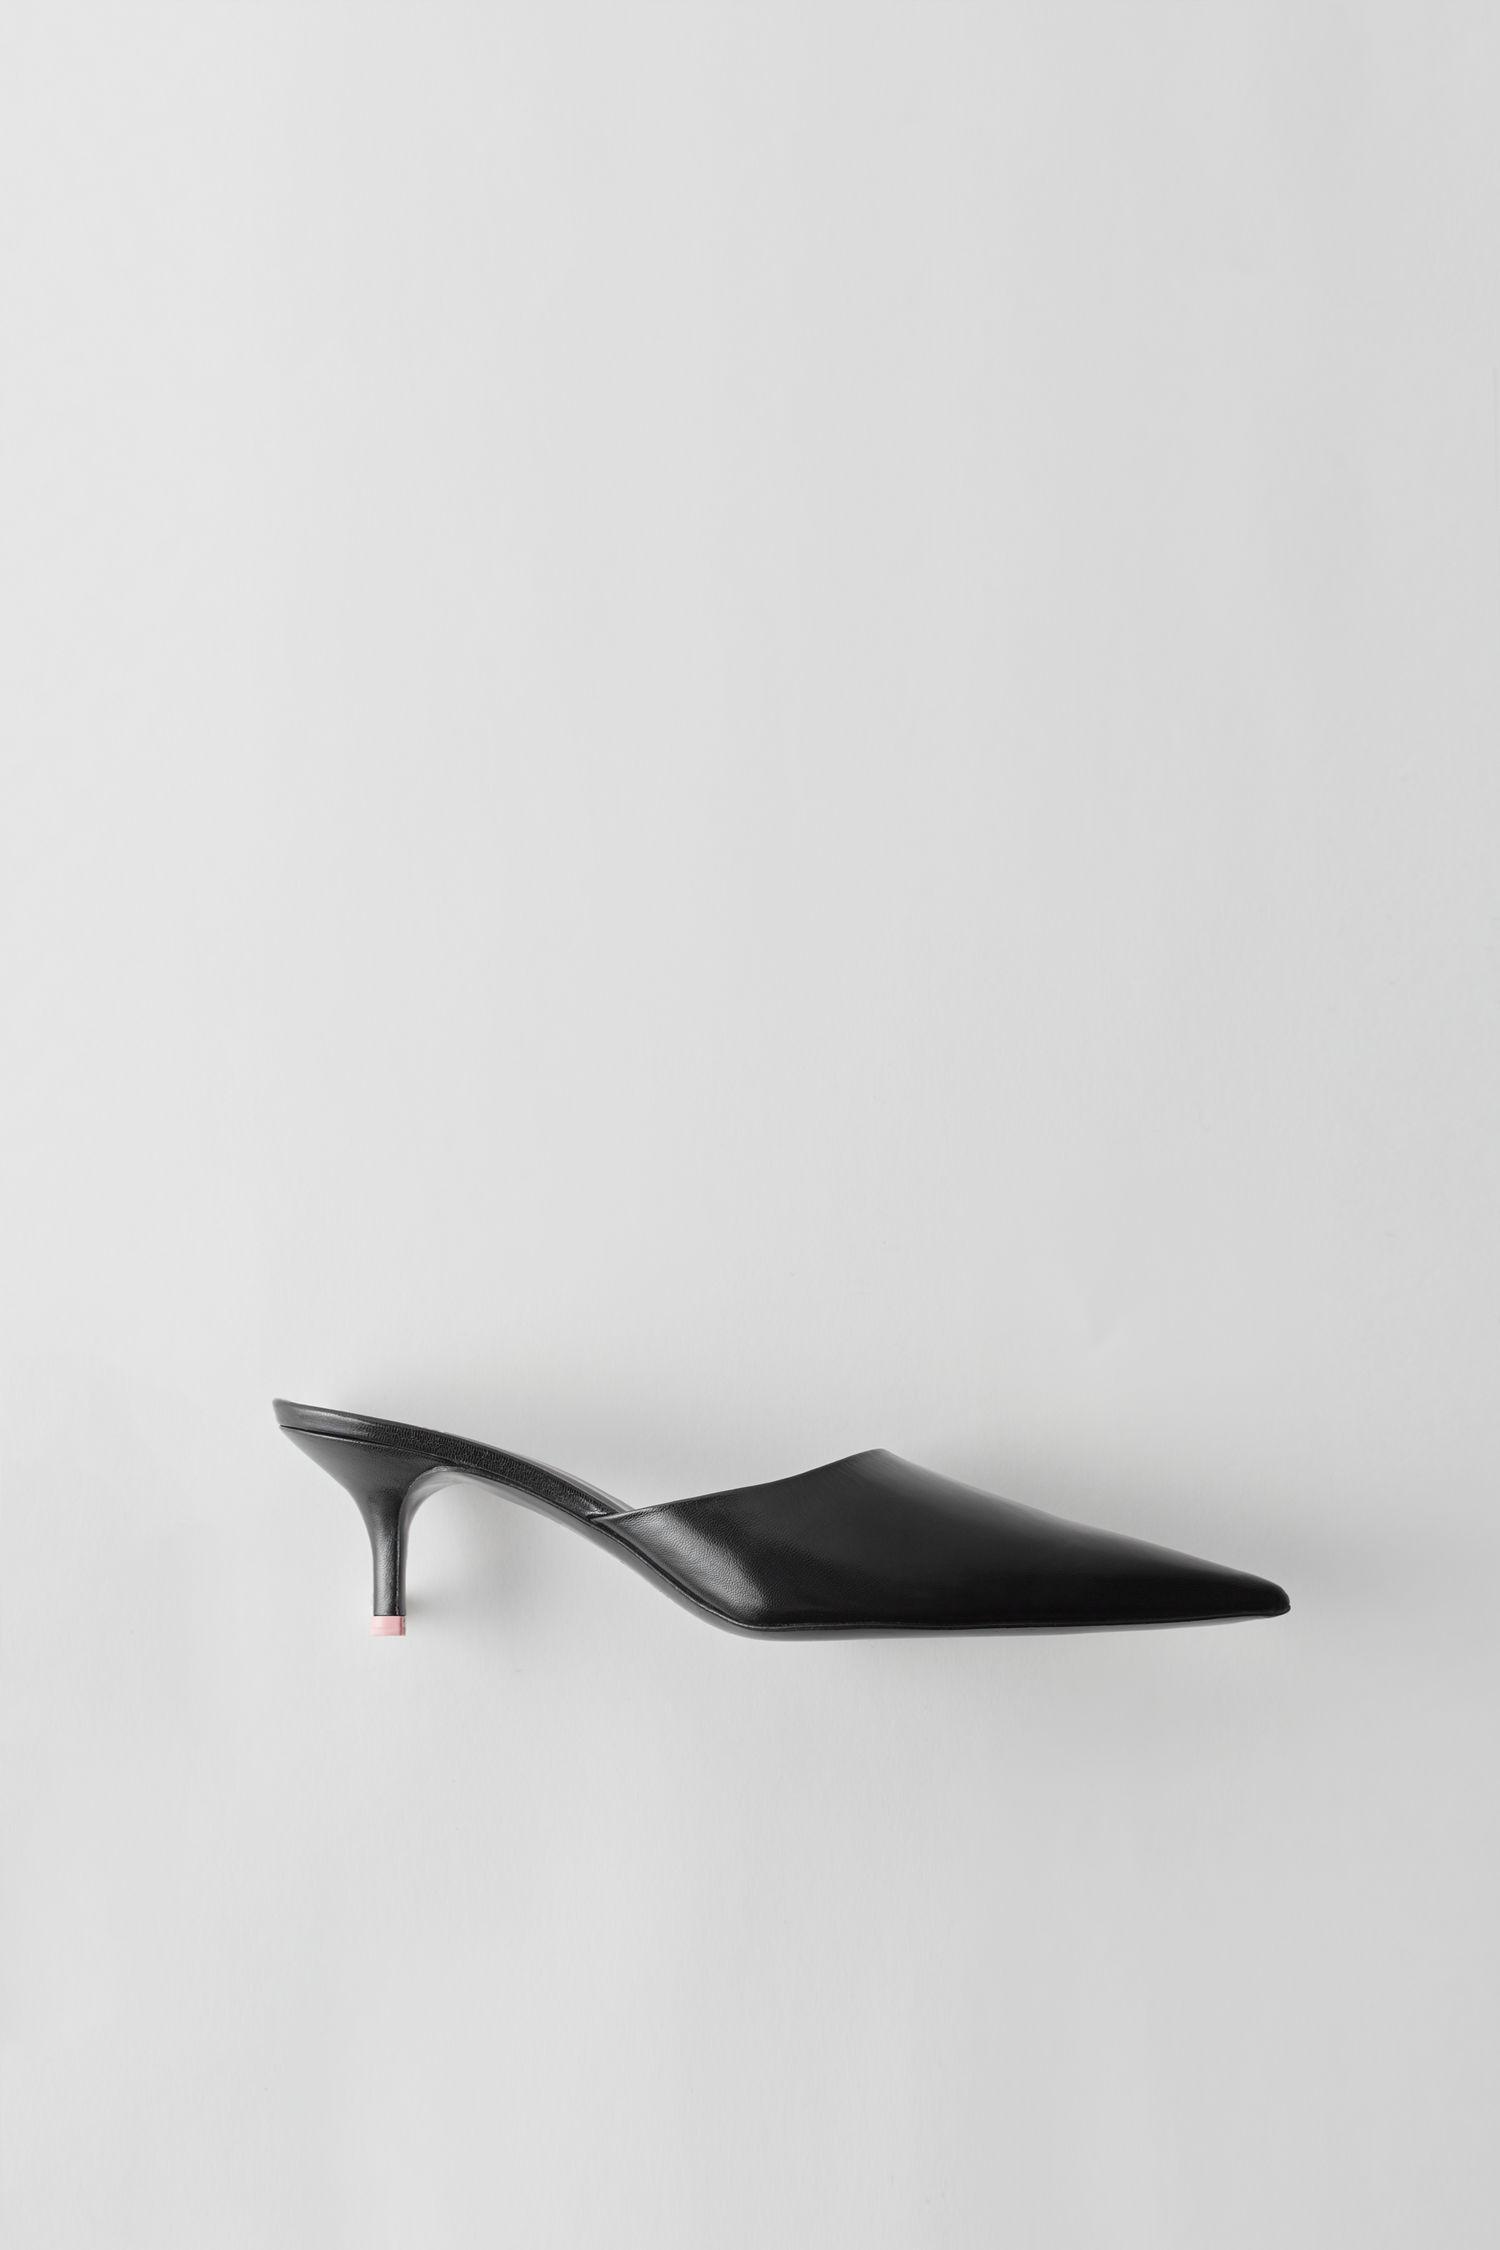 c6b5a4147 Acne Studios Black Offset Kitten Heel Mules | ModeSens